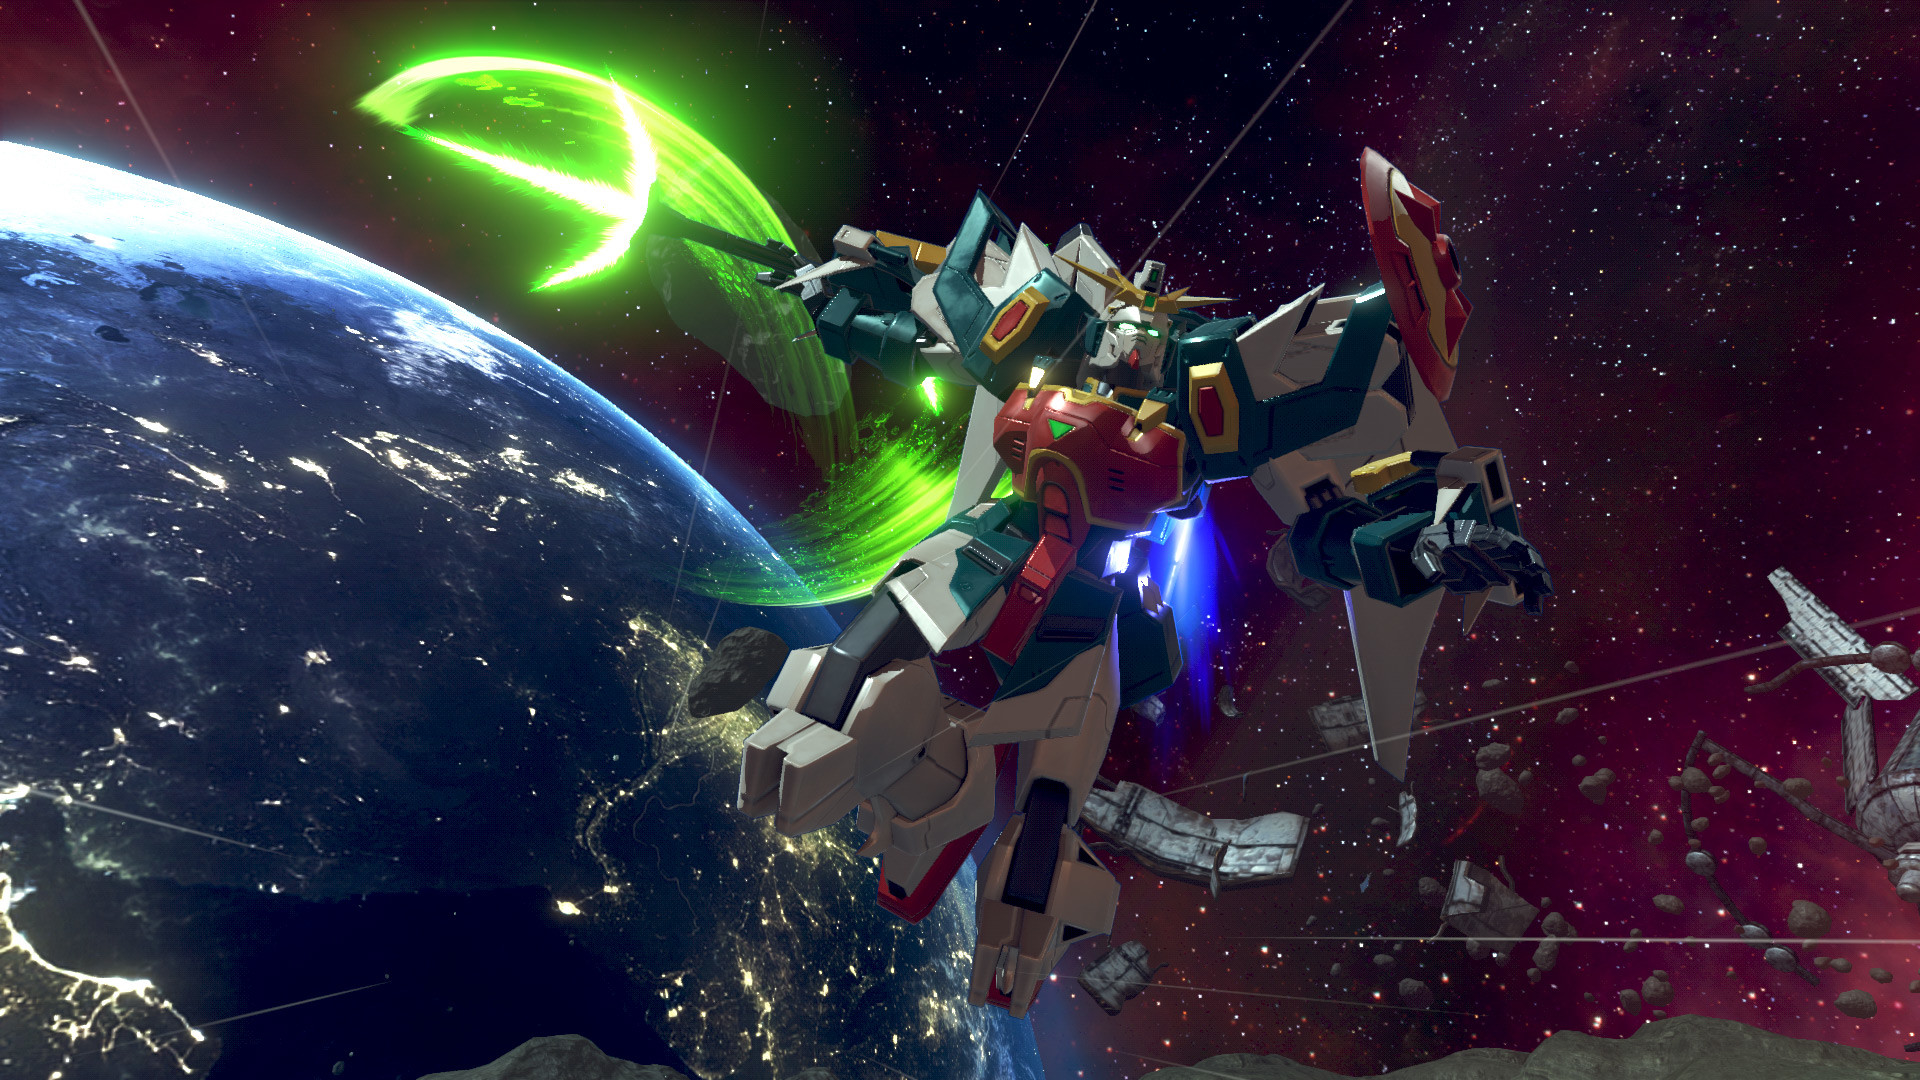 wallpaper: Gundam 00 Wallpaper Anniversary Free Legal Streaming Iphone